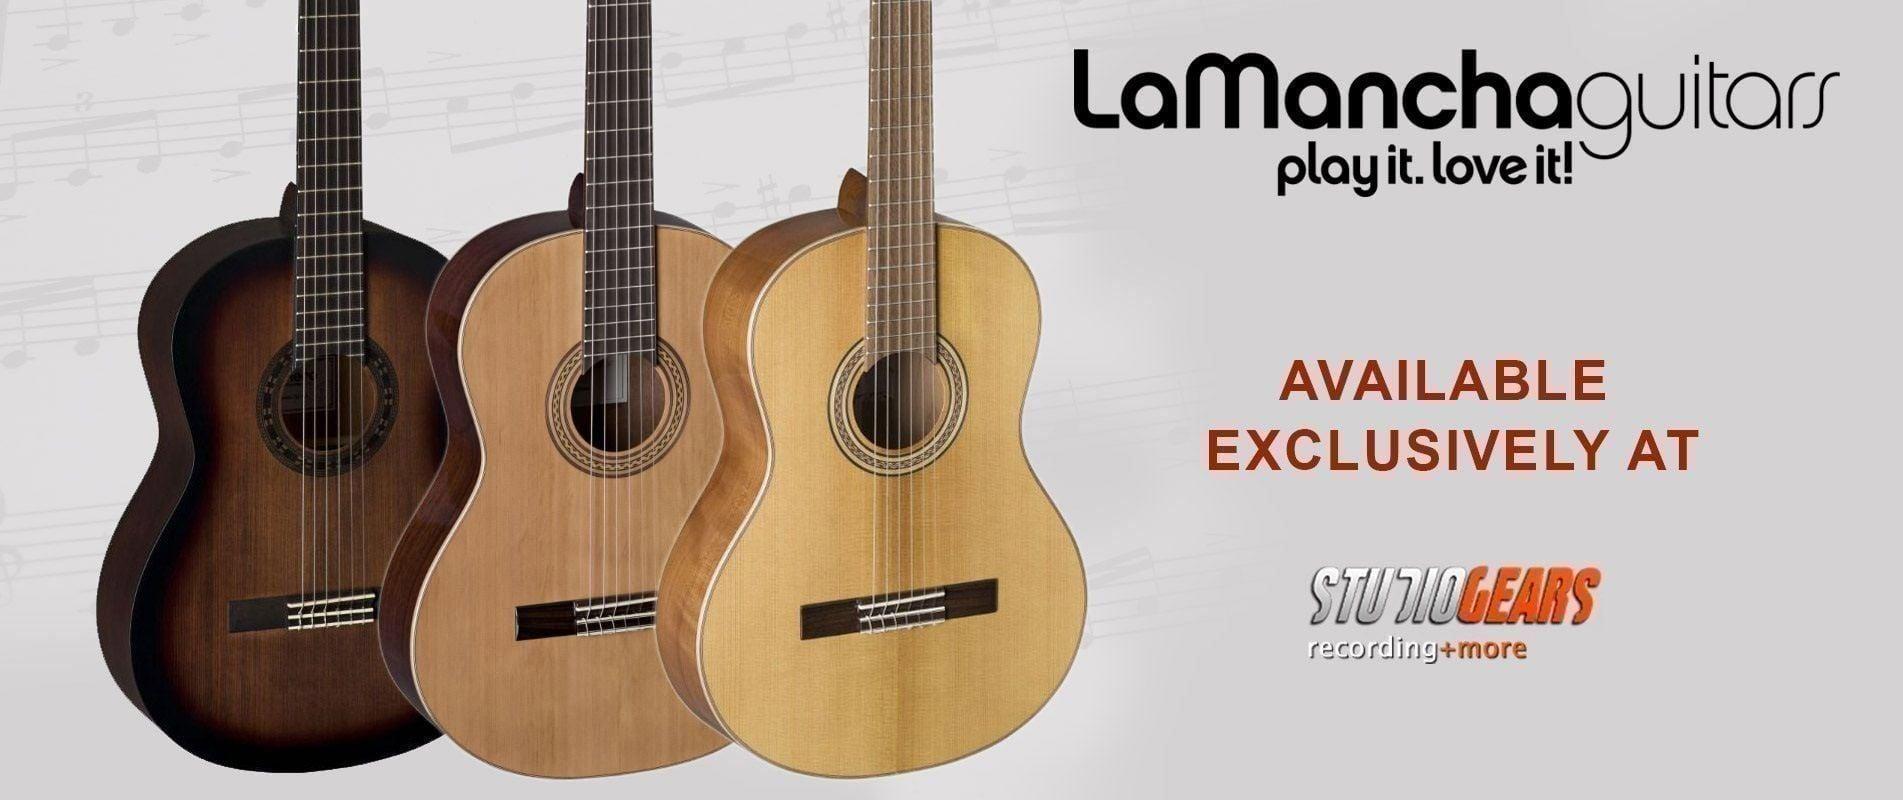 La Mancha guitars exclusively at Studio Gears